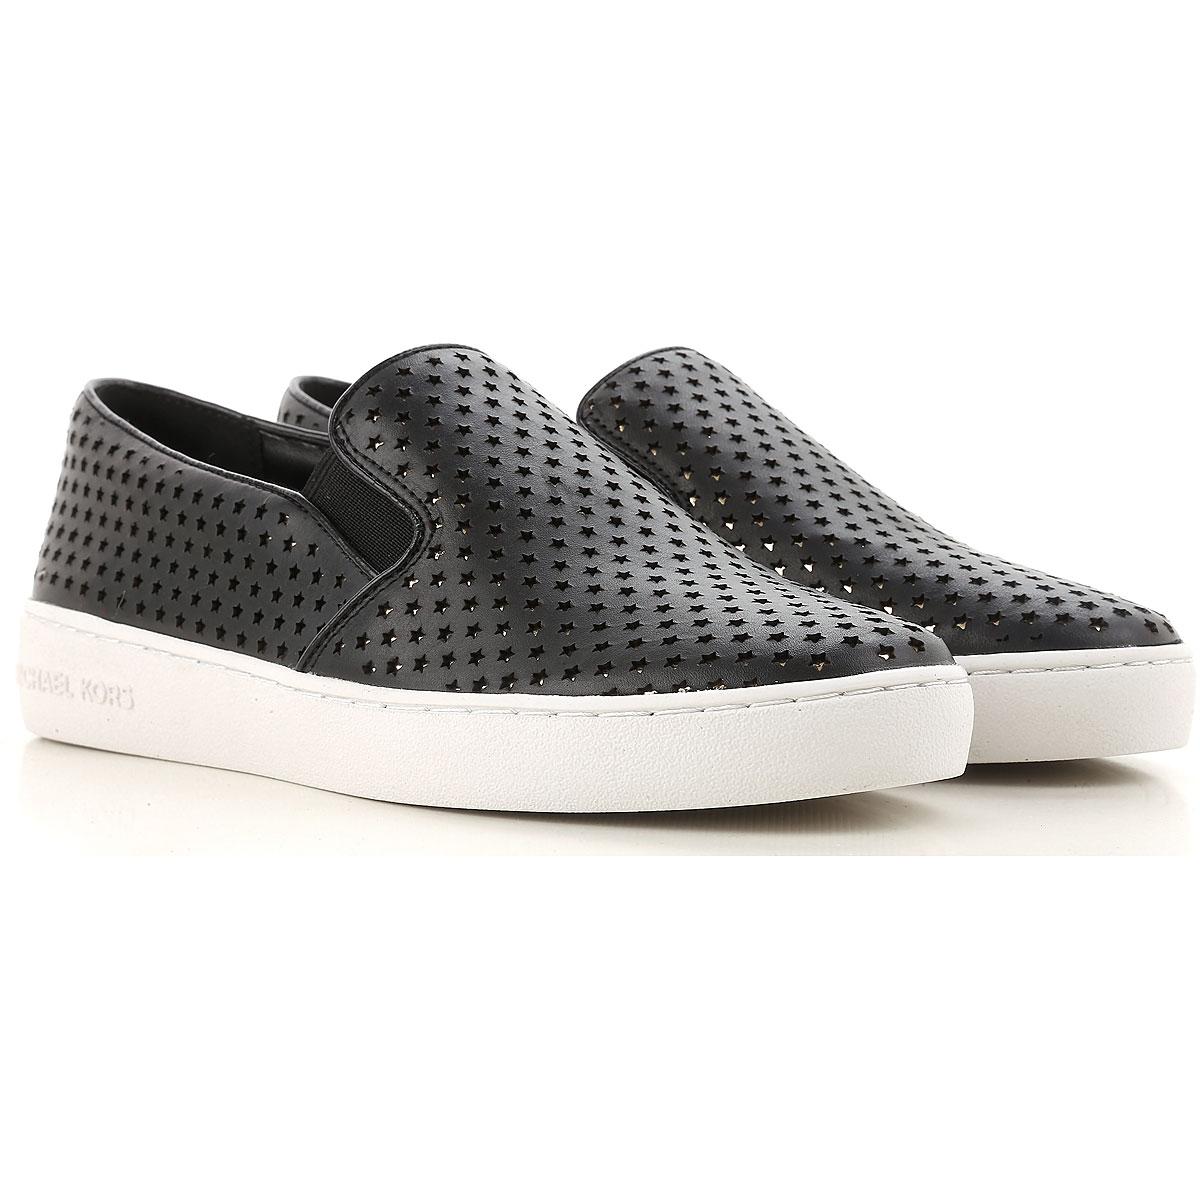 Michael Kors Slip on Sneakers for Women On Sale, Black, Leather, 2017, 3.5 4 4.5 5.5 6 7.5